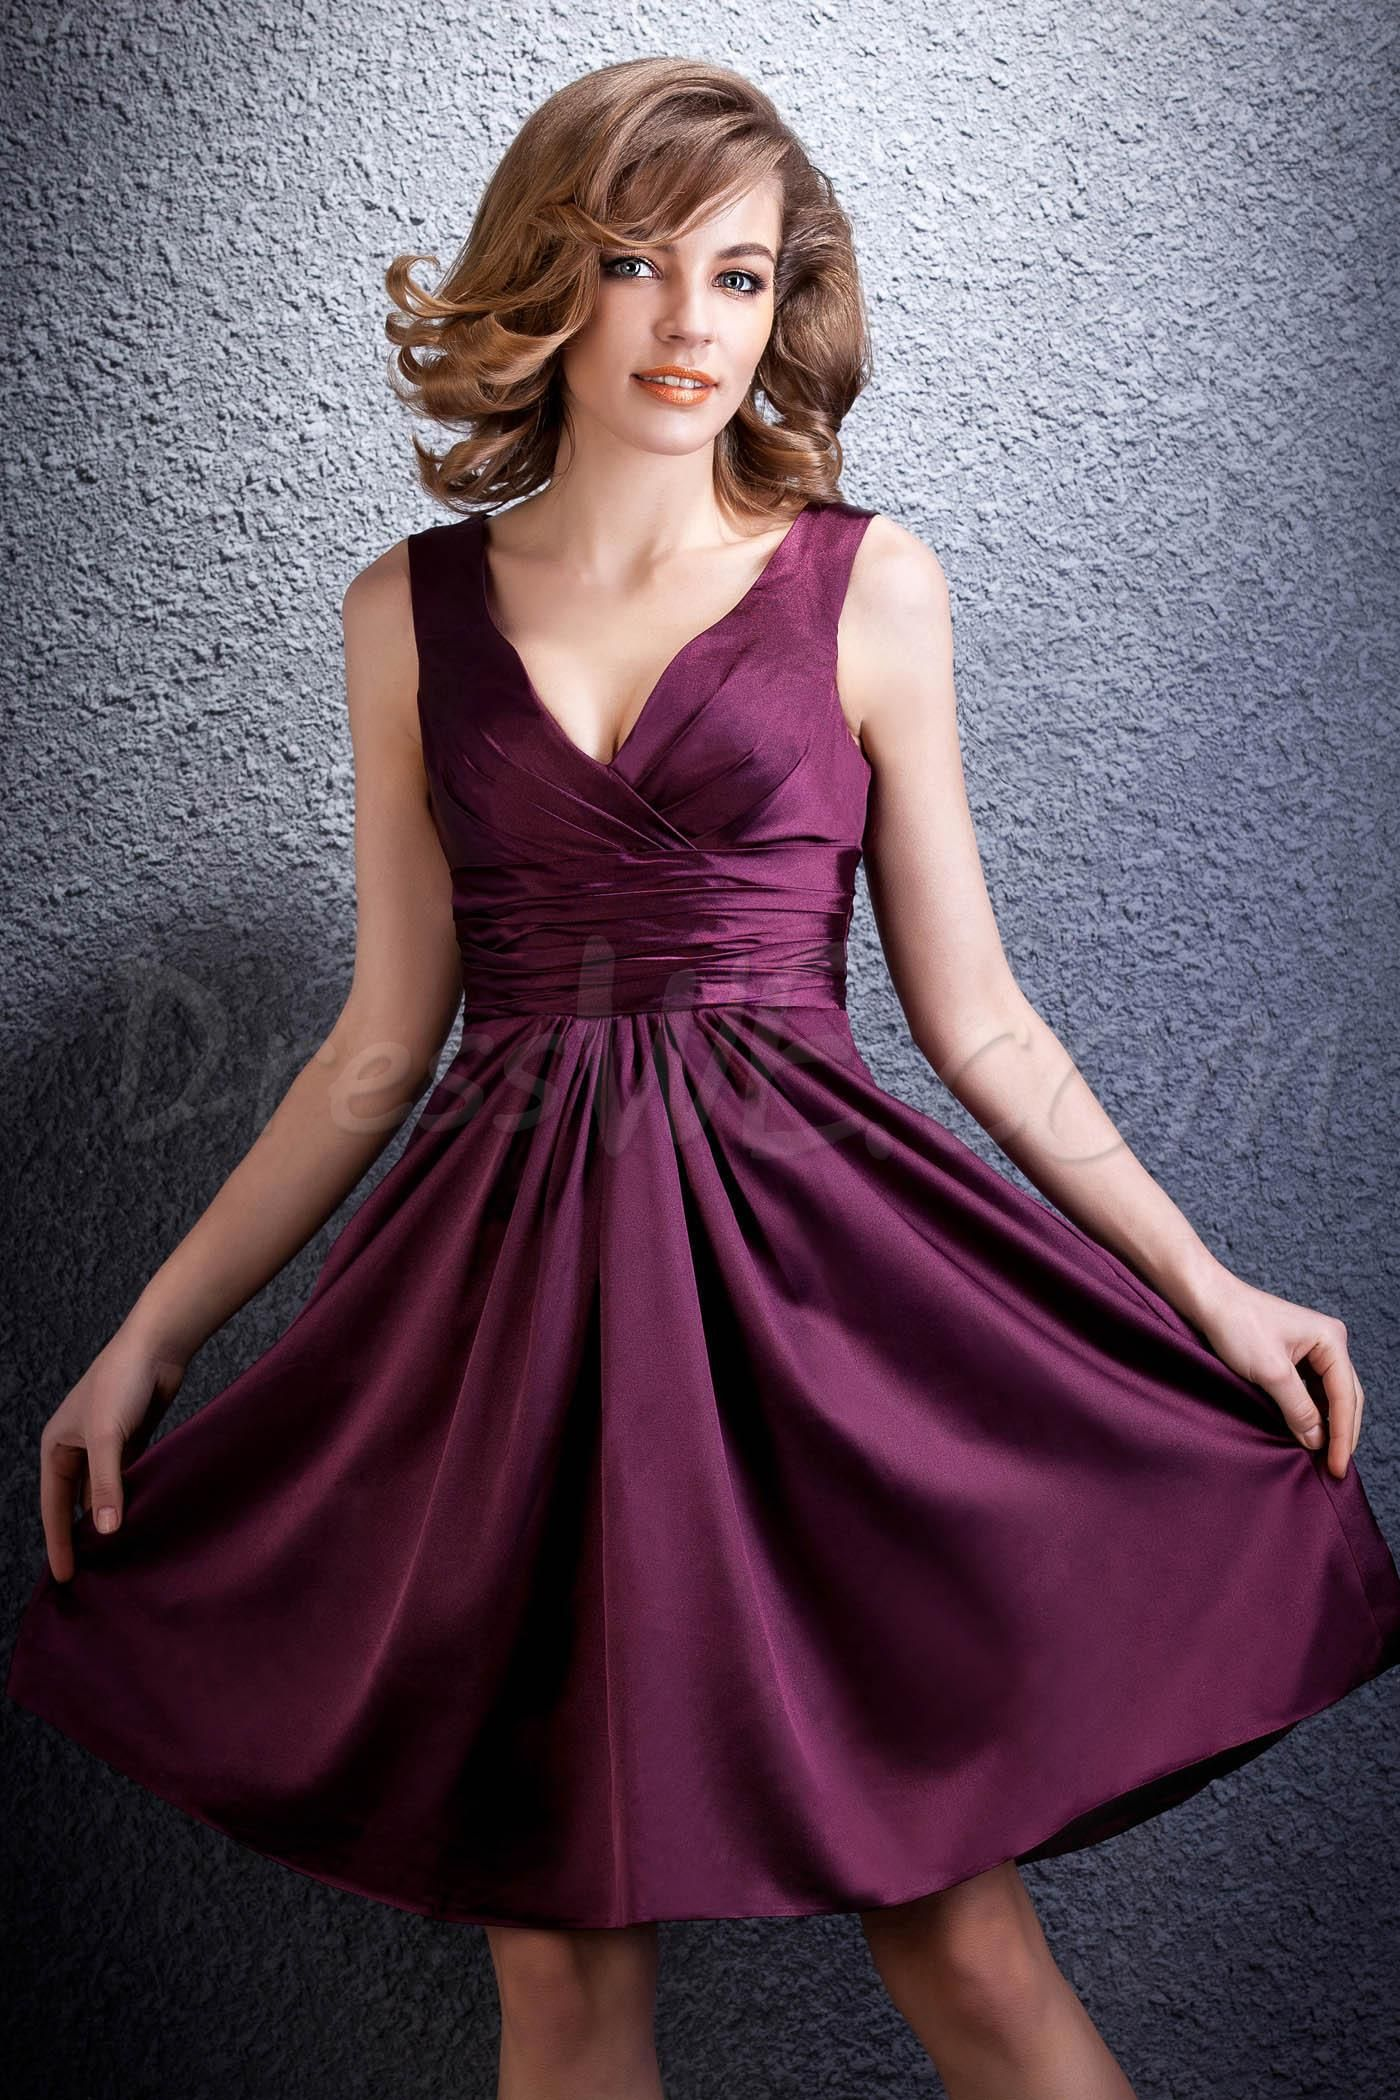 Dresswe supplies concise aline shortmini length vneck dariaus